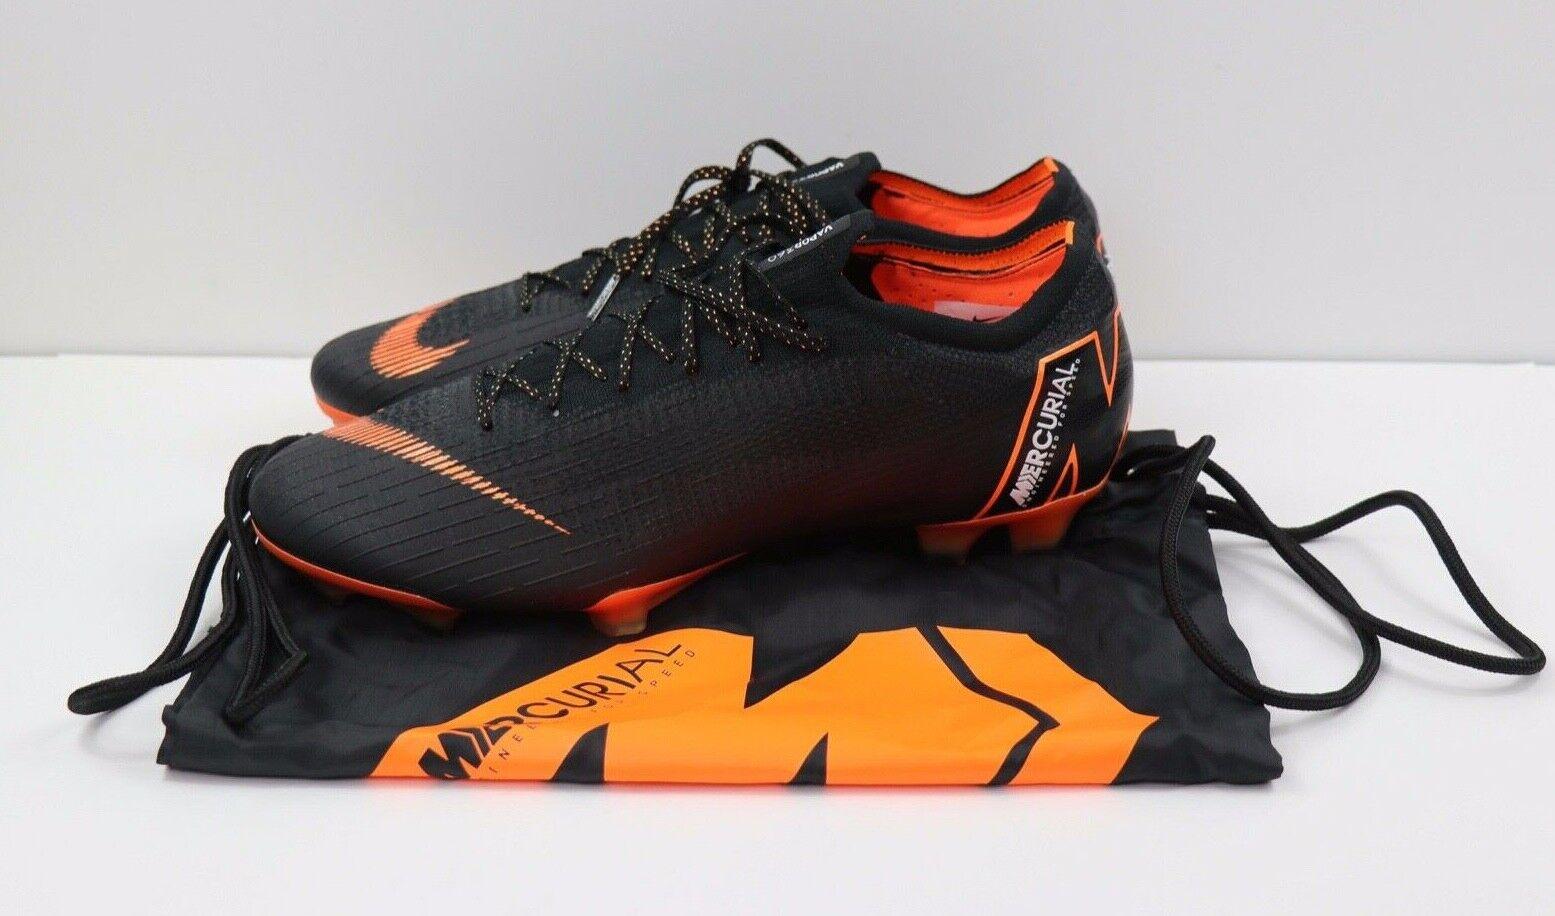 Nike Mercurial Vapor 12 360 Elite FG Black Orange Cleats AH7380-082 Mens Sz 12.5